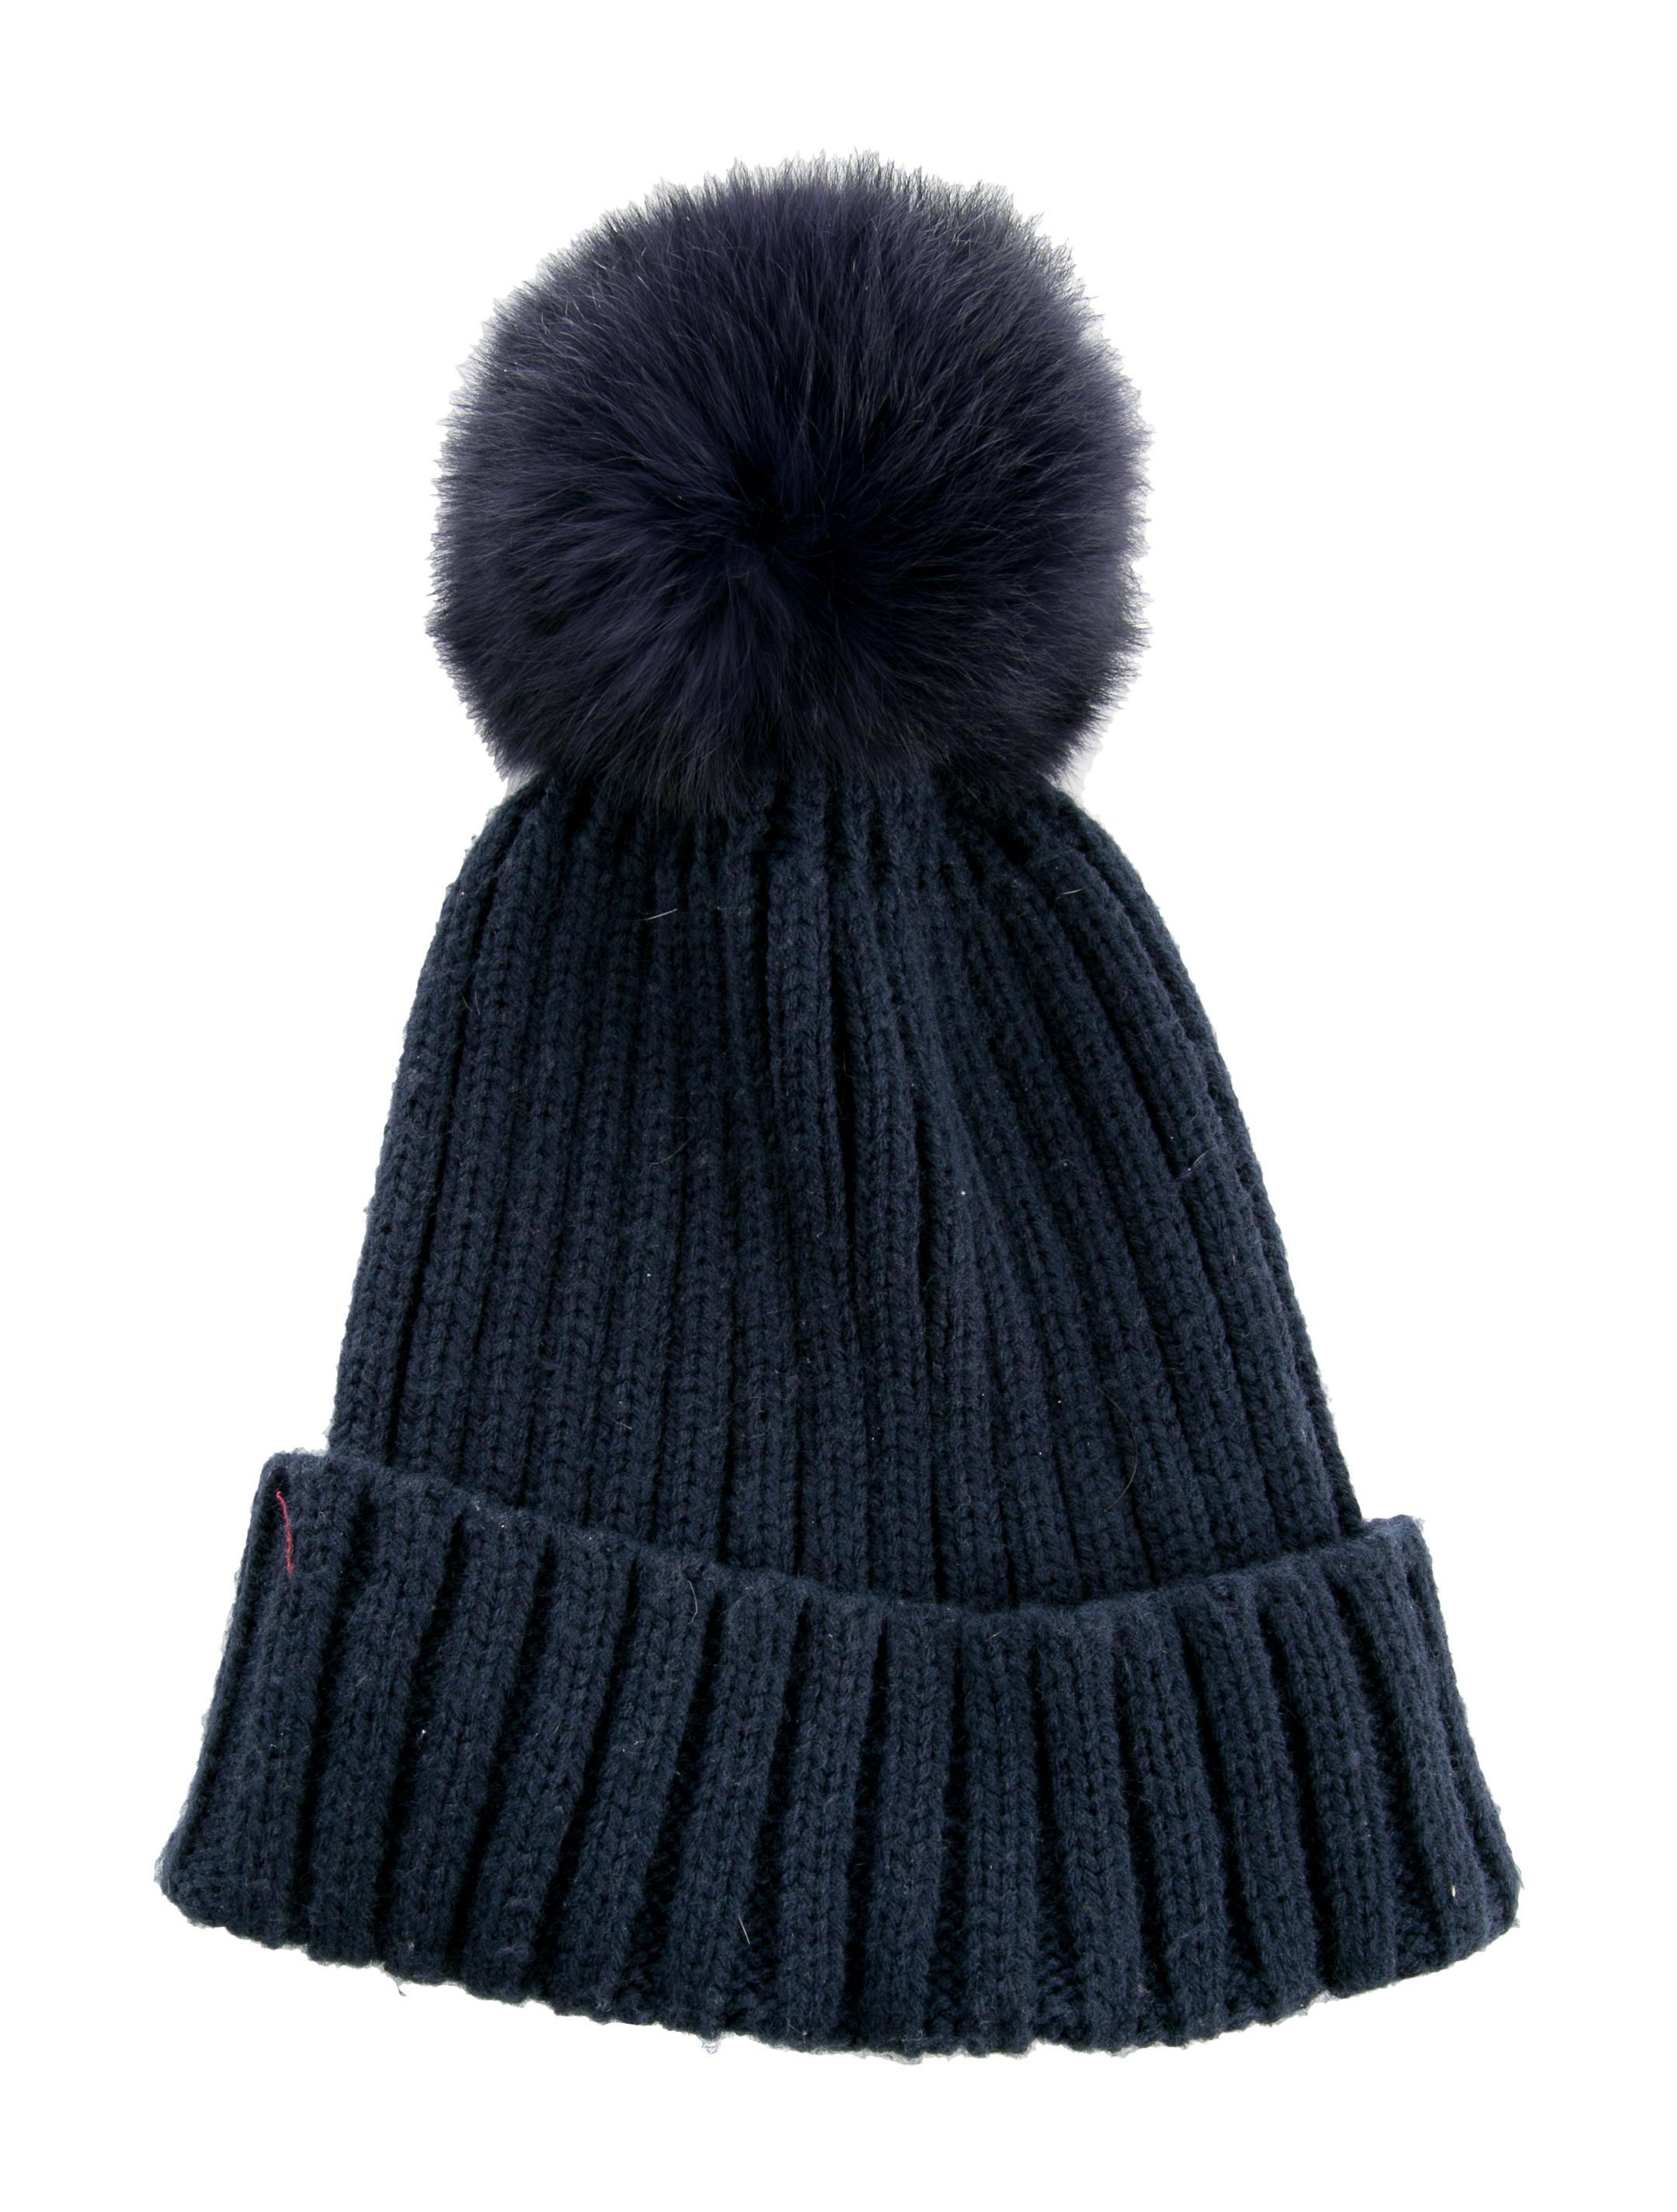 9137d00599f1d7 Adrienne Landau Fur Pom-Pom Beanie - Accessories - ADR22669 | The ...